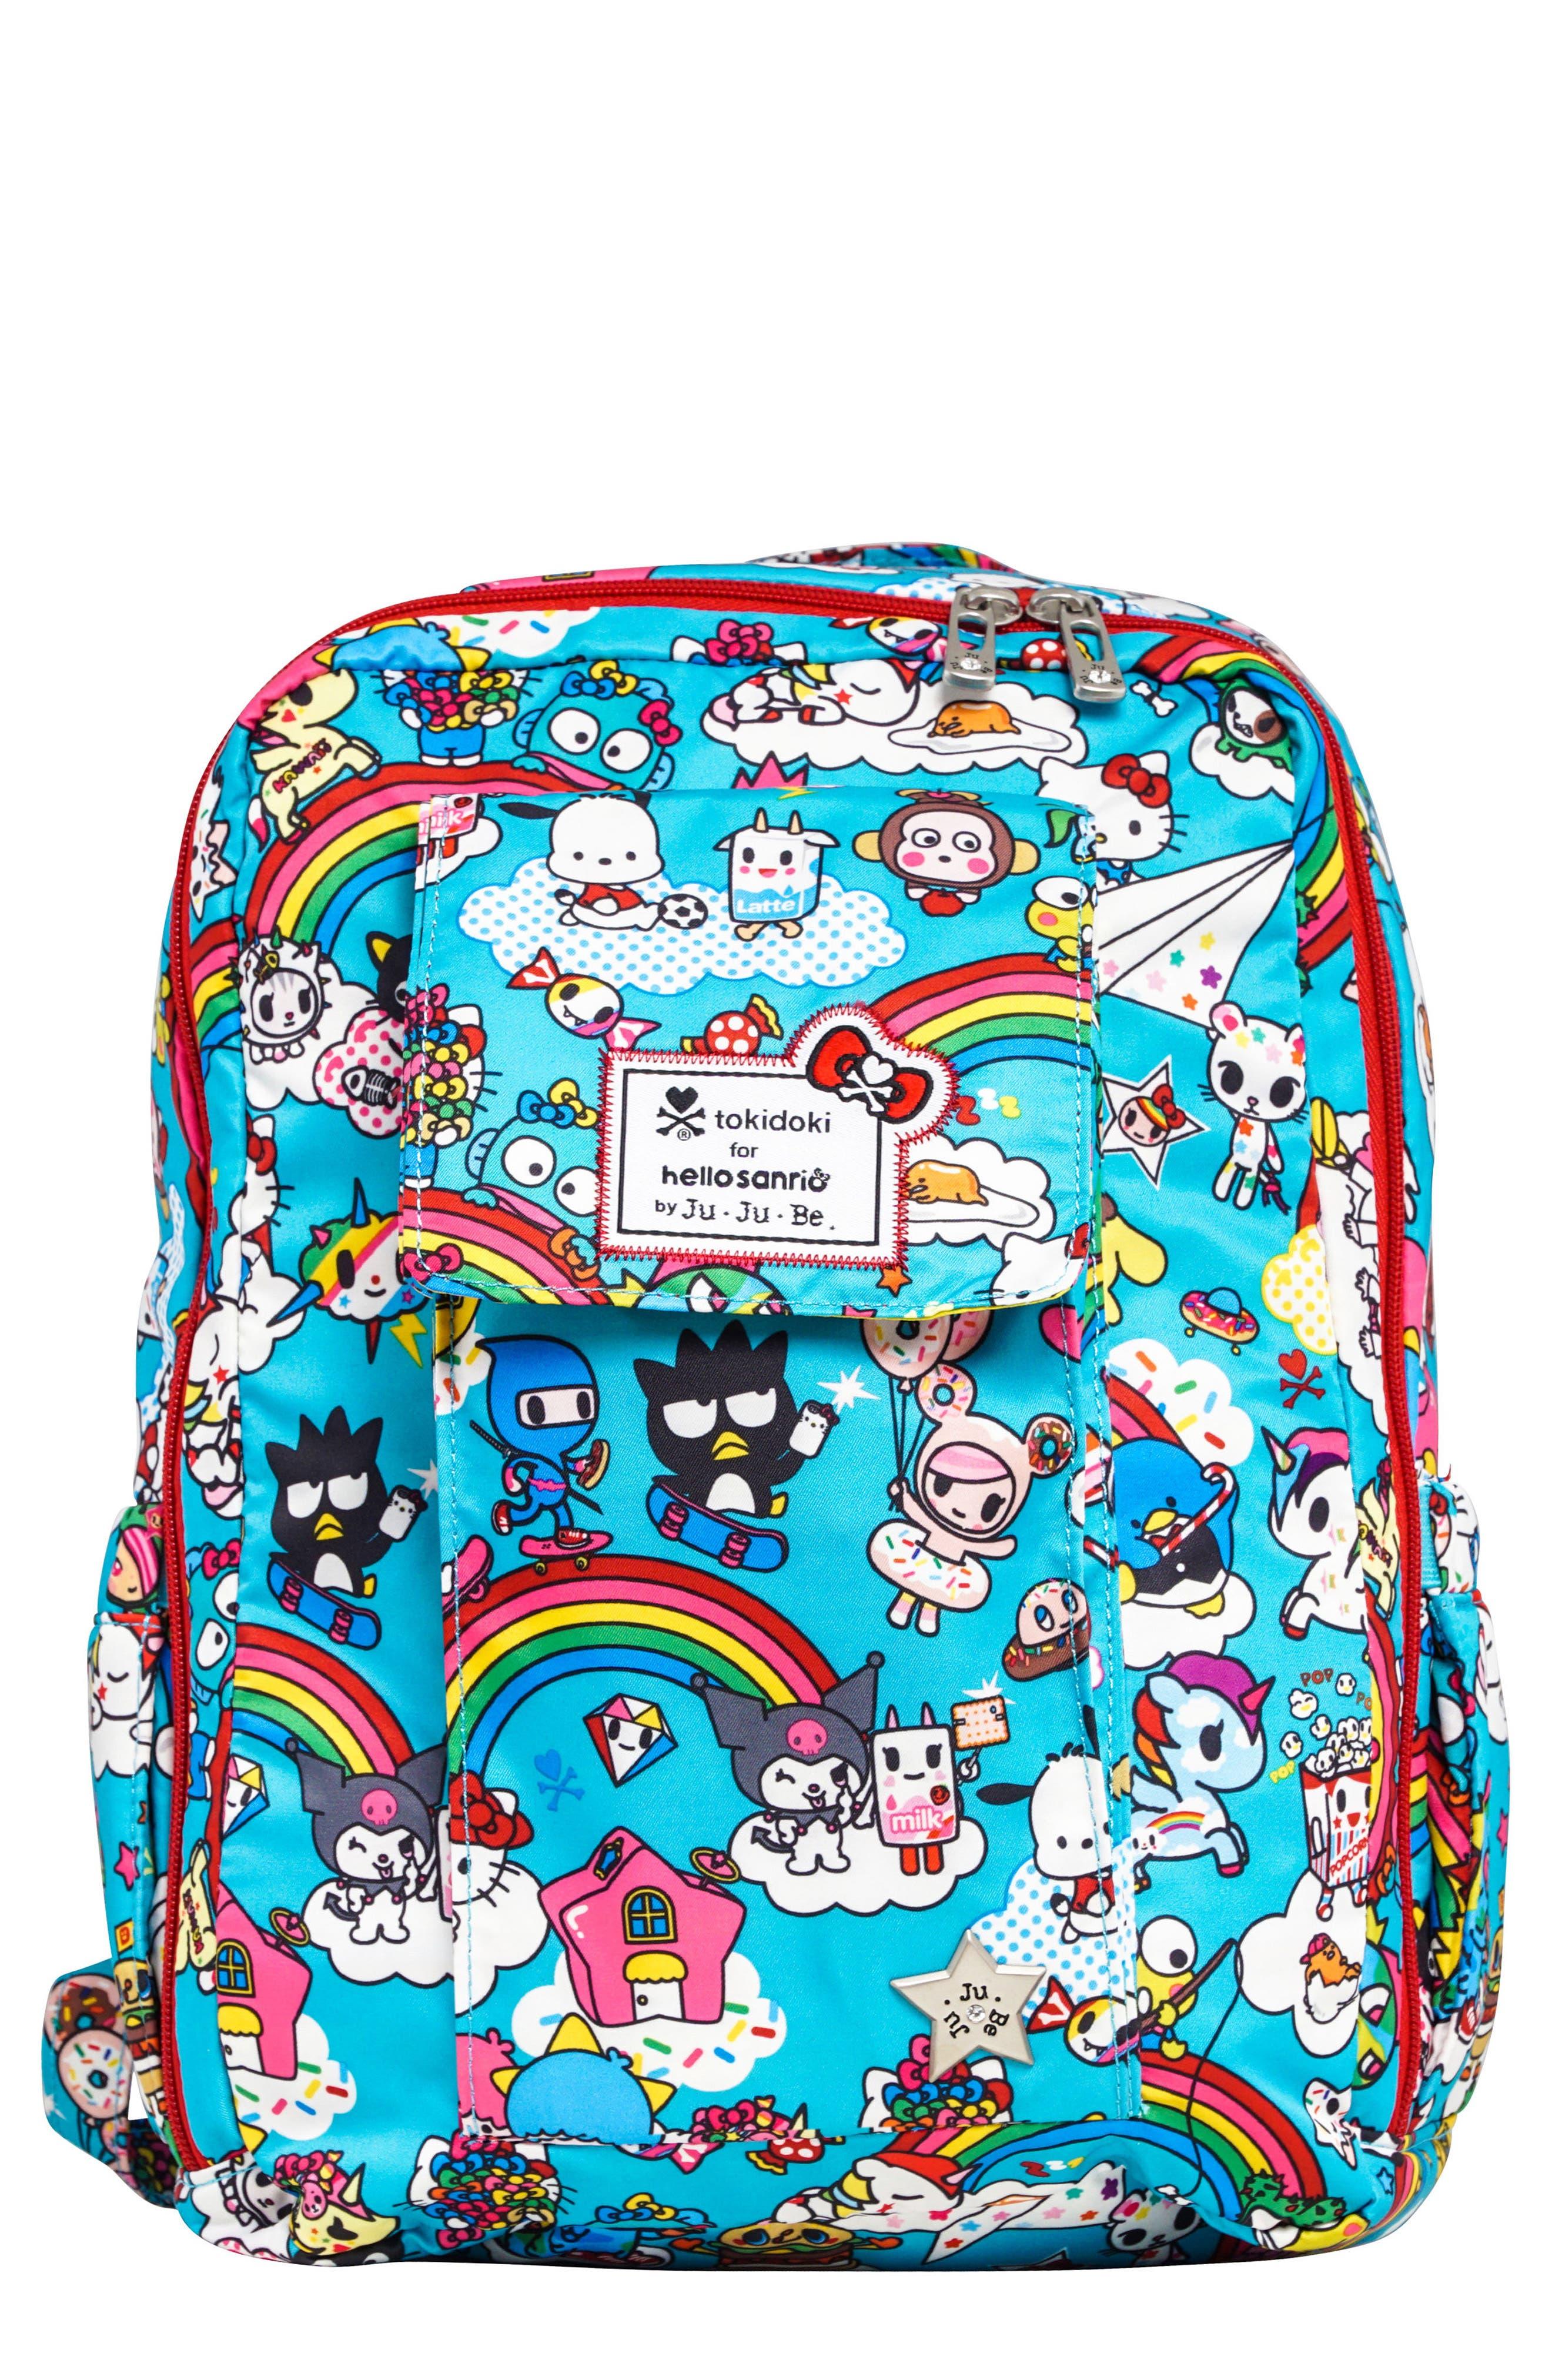 x tokidoki for Hello Sanrio Rainbow Dreams Be Mini Backpack,                         Main,                         color, 433